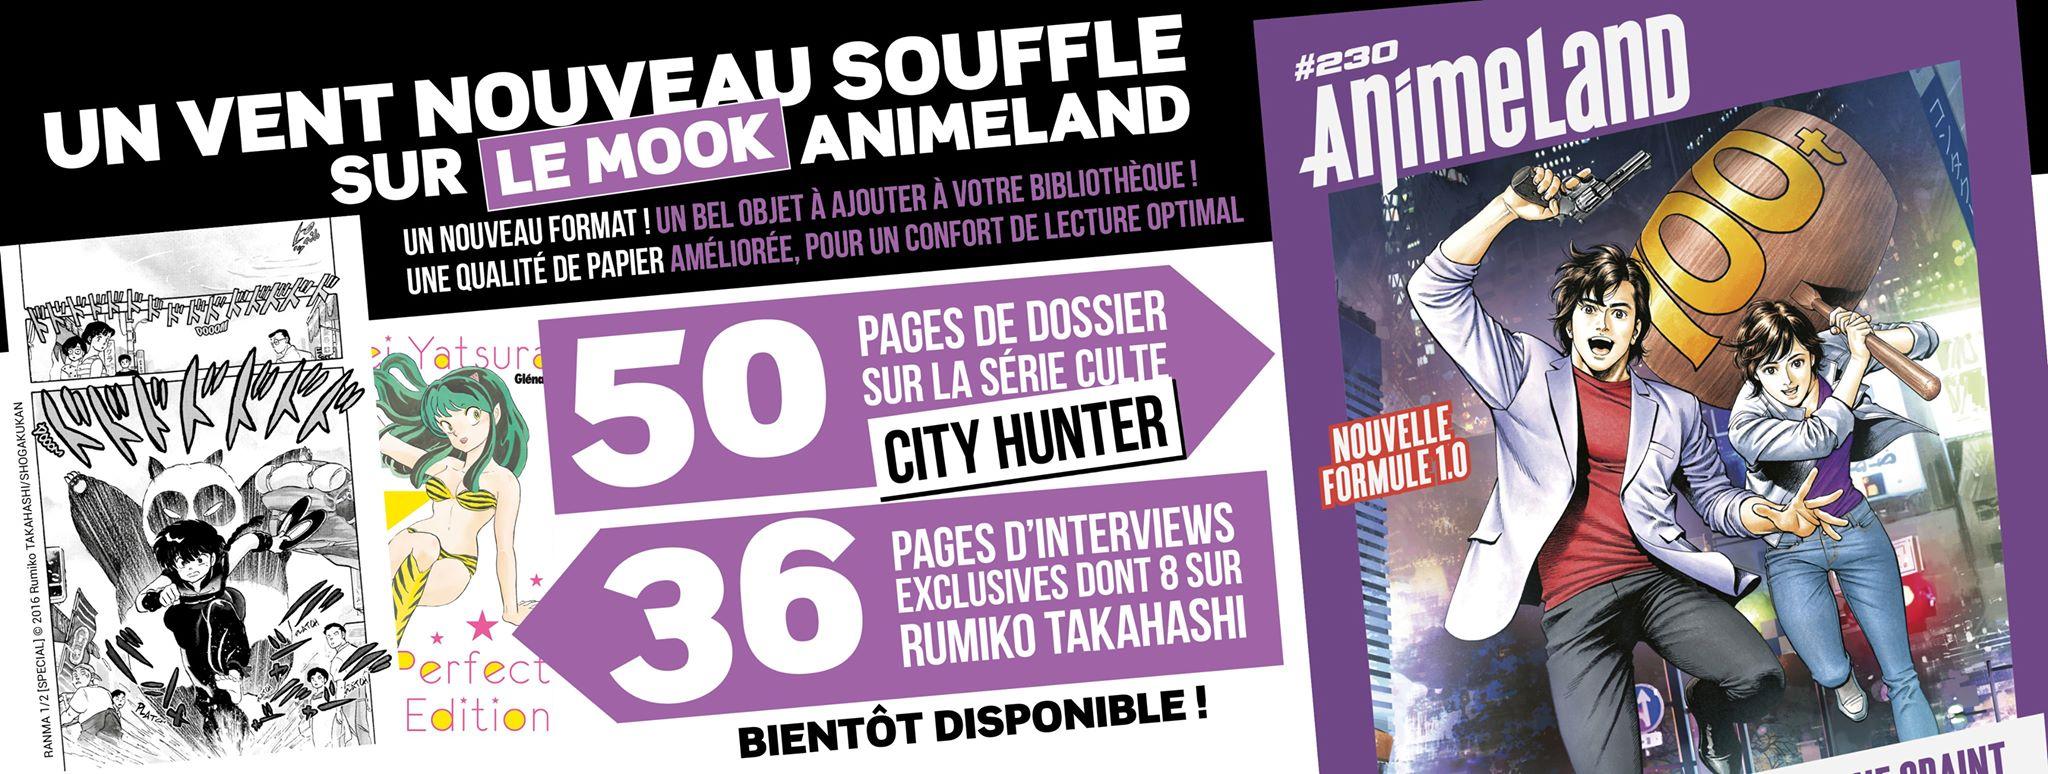 AnimeLand 230